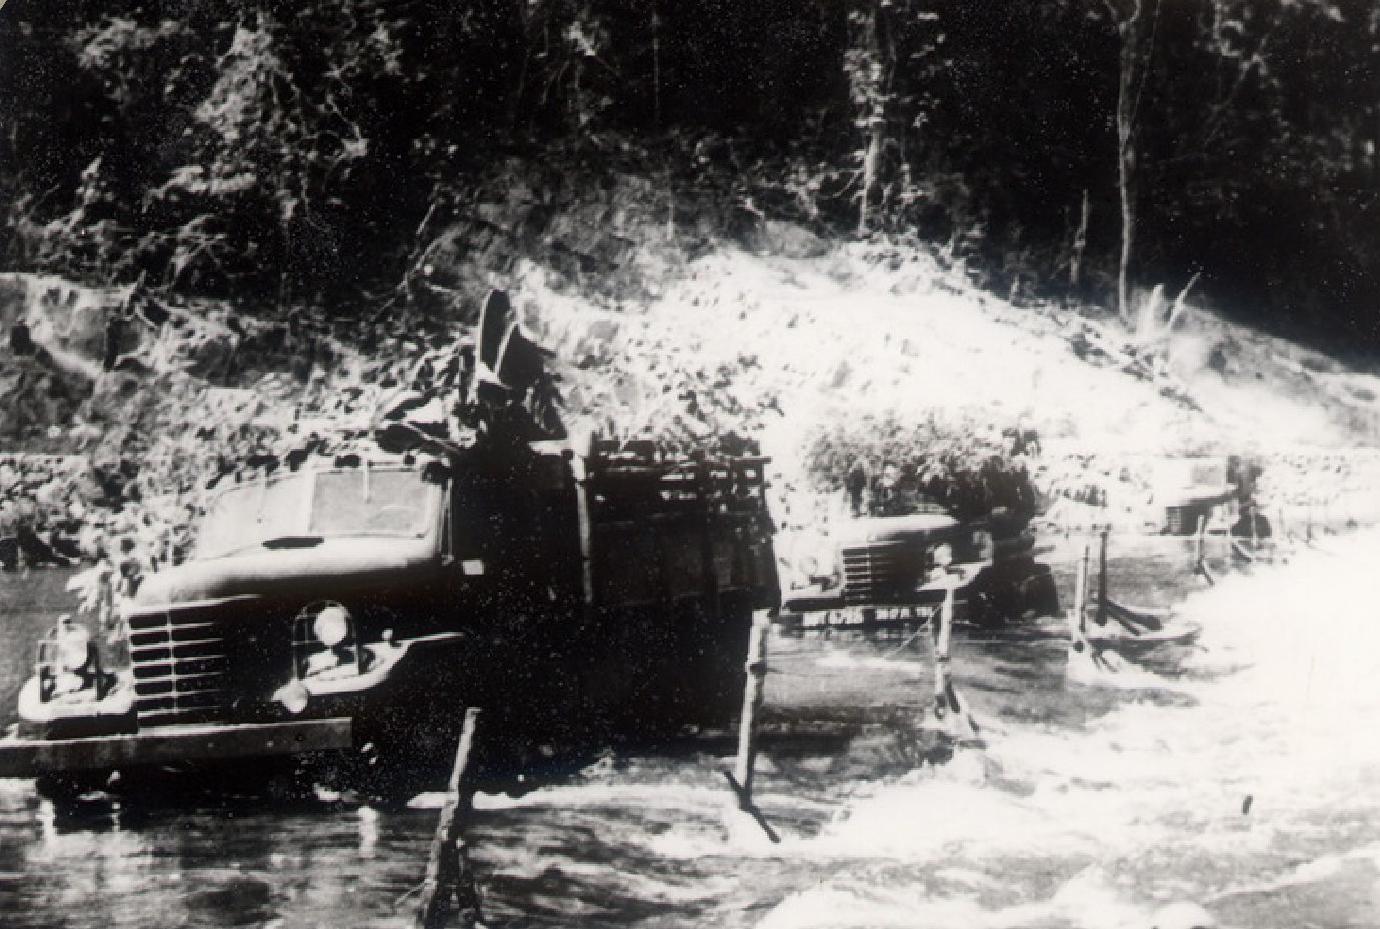 Viet Minh Trucks Fording a Stream